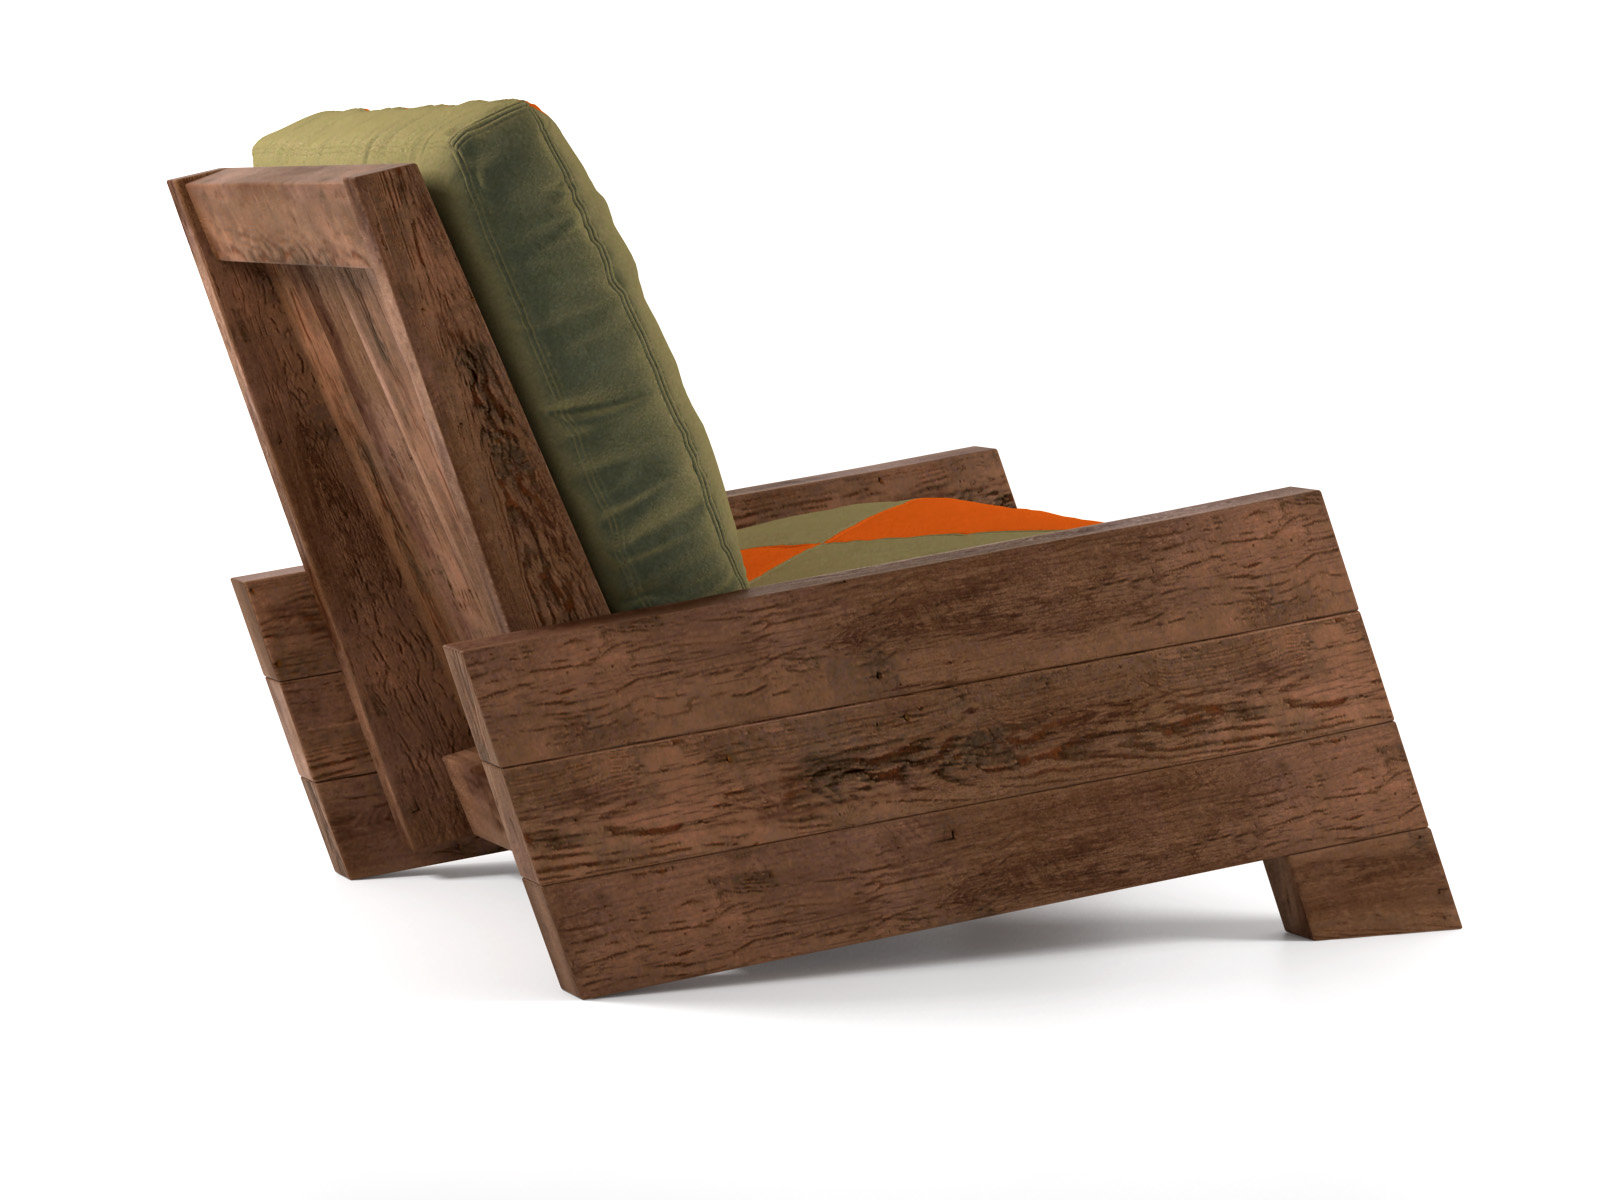 Asturias armchair 3d model carlos motta for Carlos motta designer